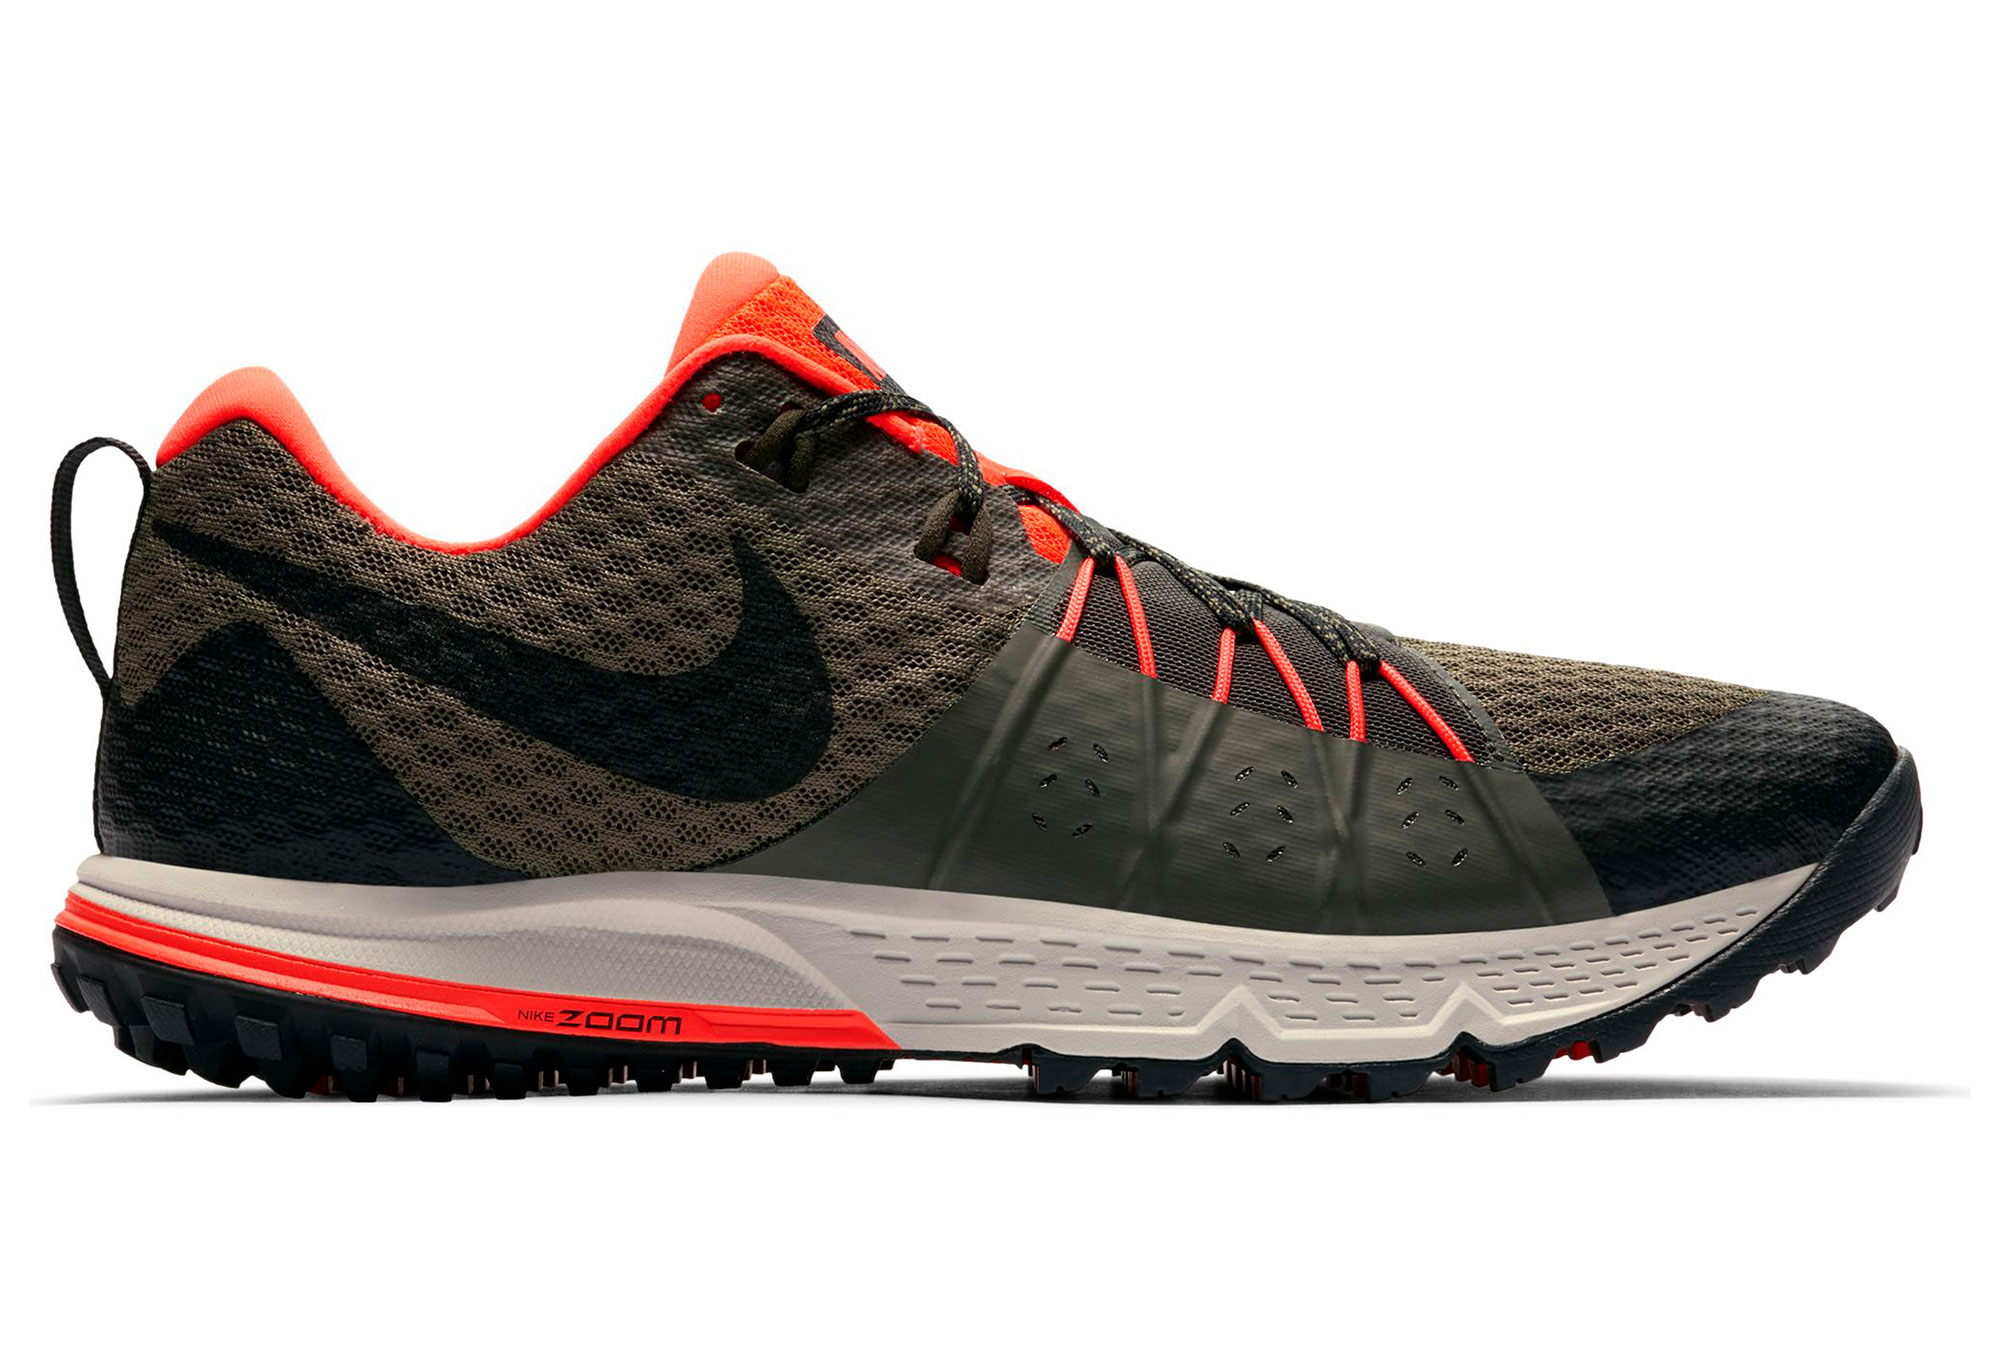 bbba6e8421f9d Nike Shoes Air Zoom Wildhorse 4 Khaki Orange Men